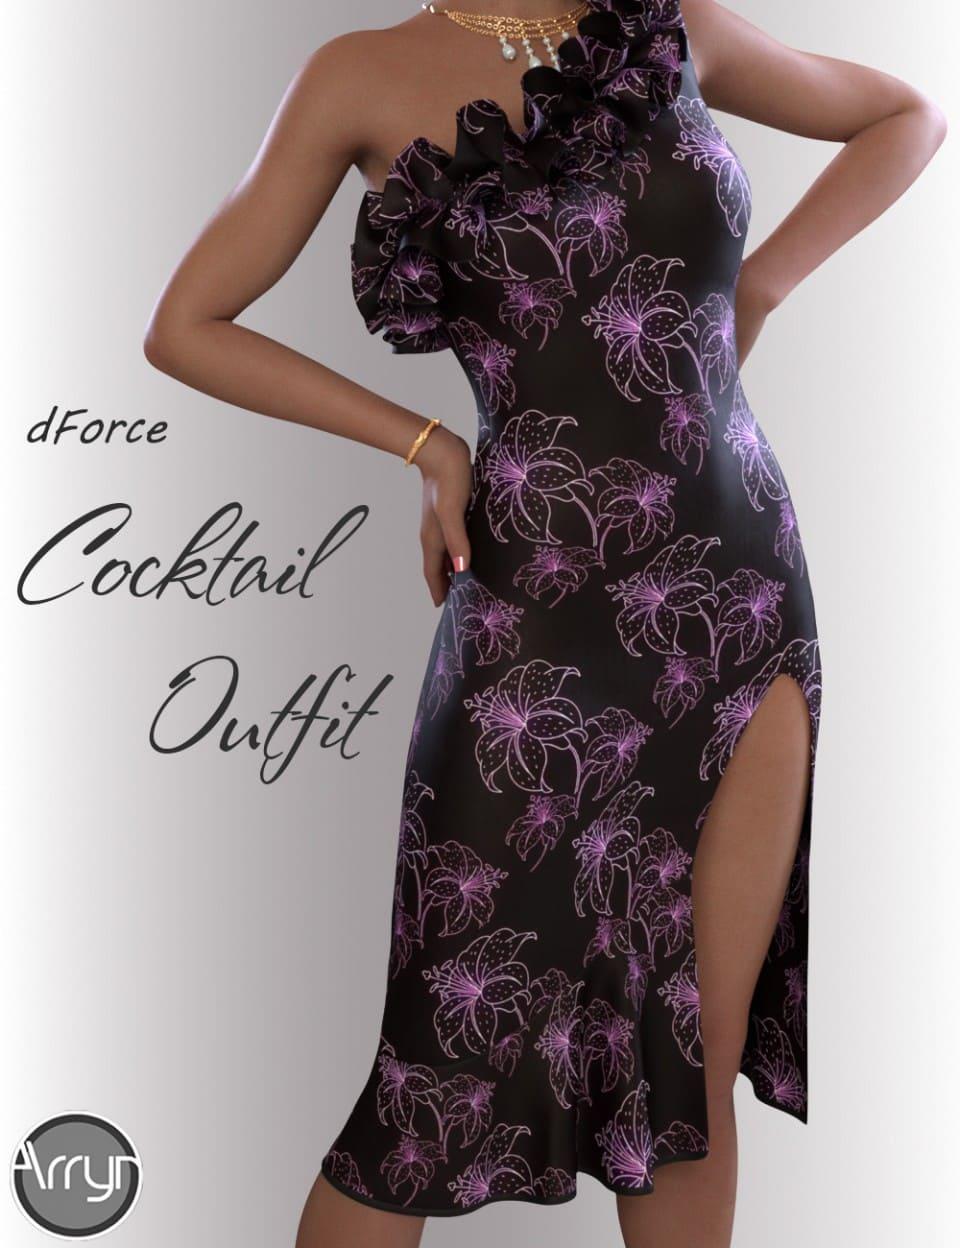 dForce Evening Cocktail Dress Outfit for Genesis 8 Female(s)_DAZ3D下载站